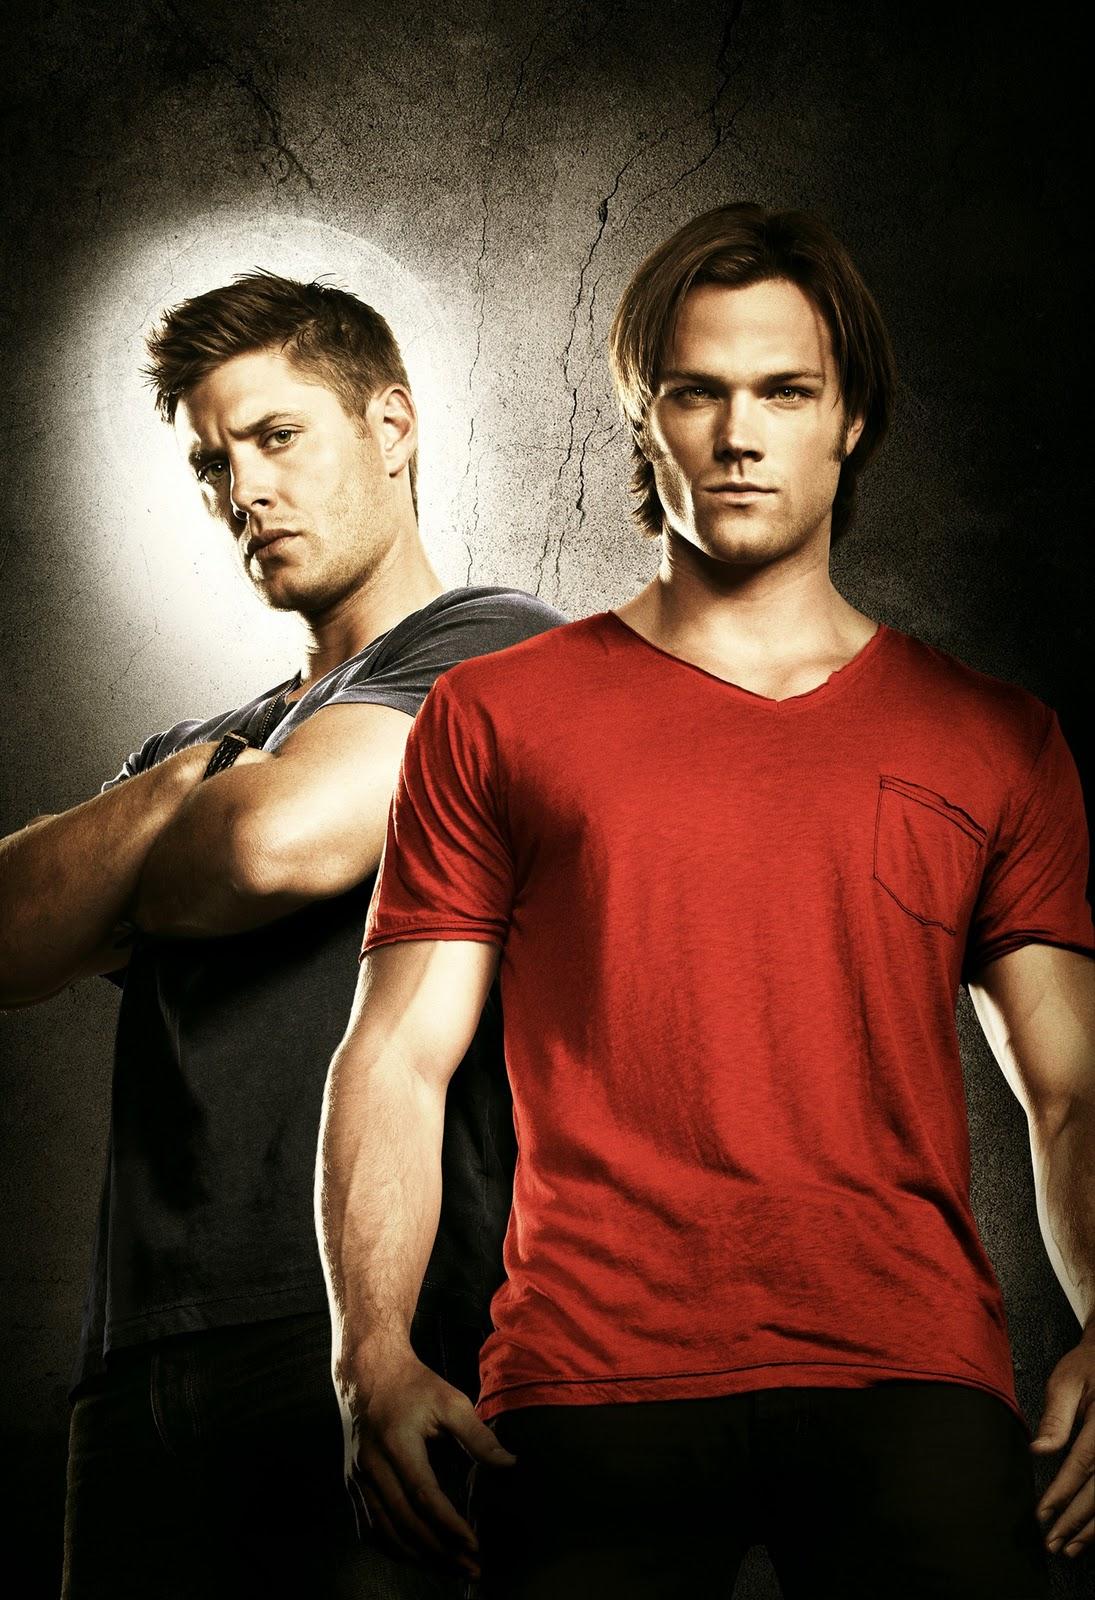 http://2.bp.blogspot.com/_j0iAUCPJoAg/TNQlJv9Aw9I/AAAAAAAAEYY/4G2qQuU3Og8/s1600/Supernatural+Season+(1).jpg